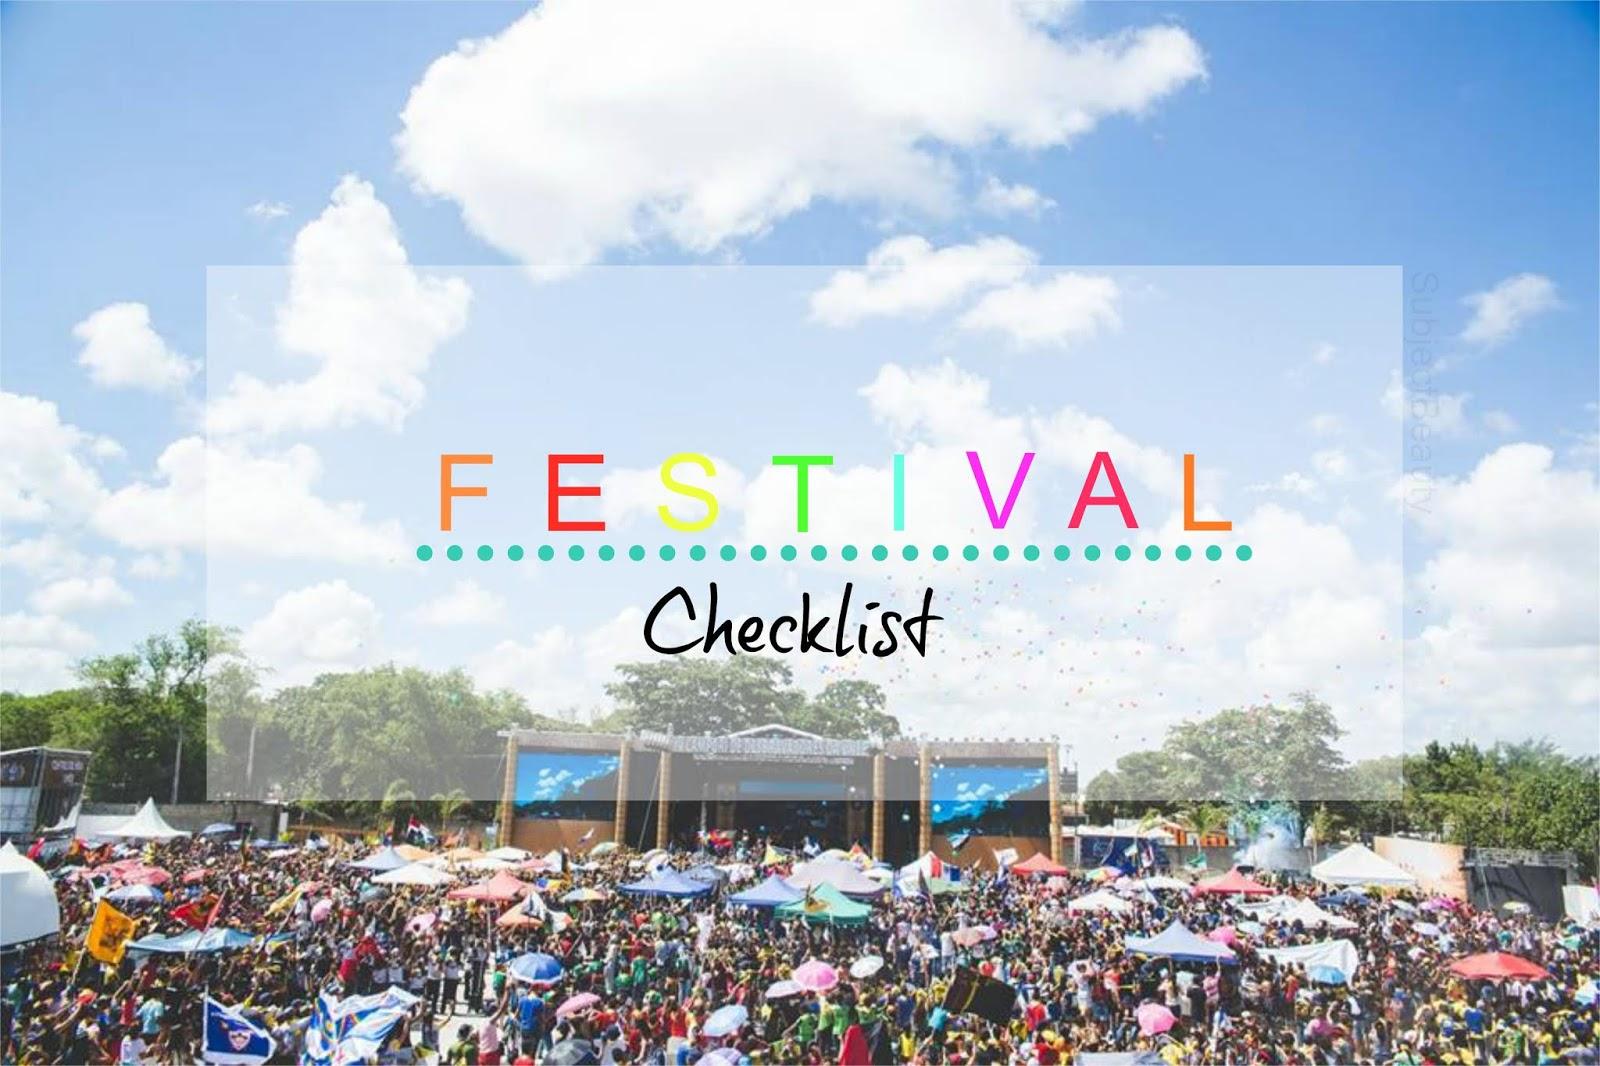 Festival Checklist